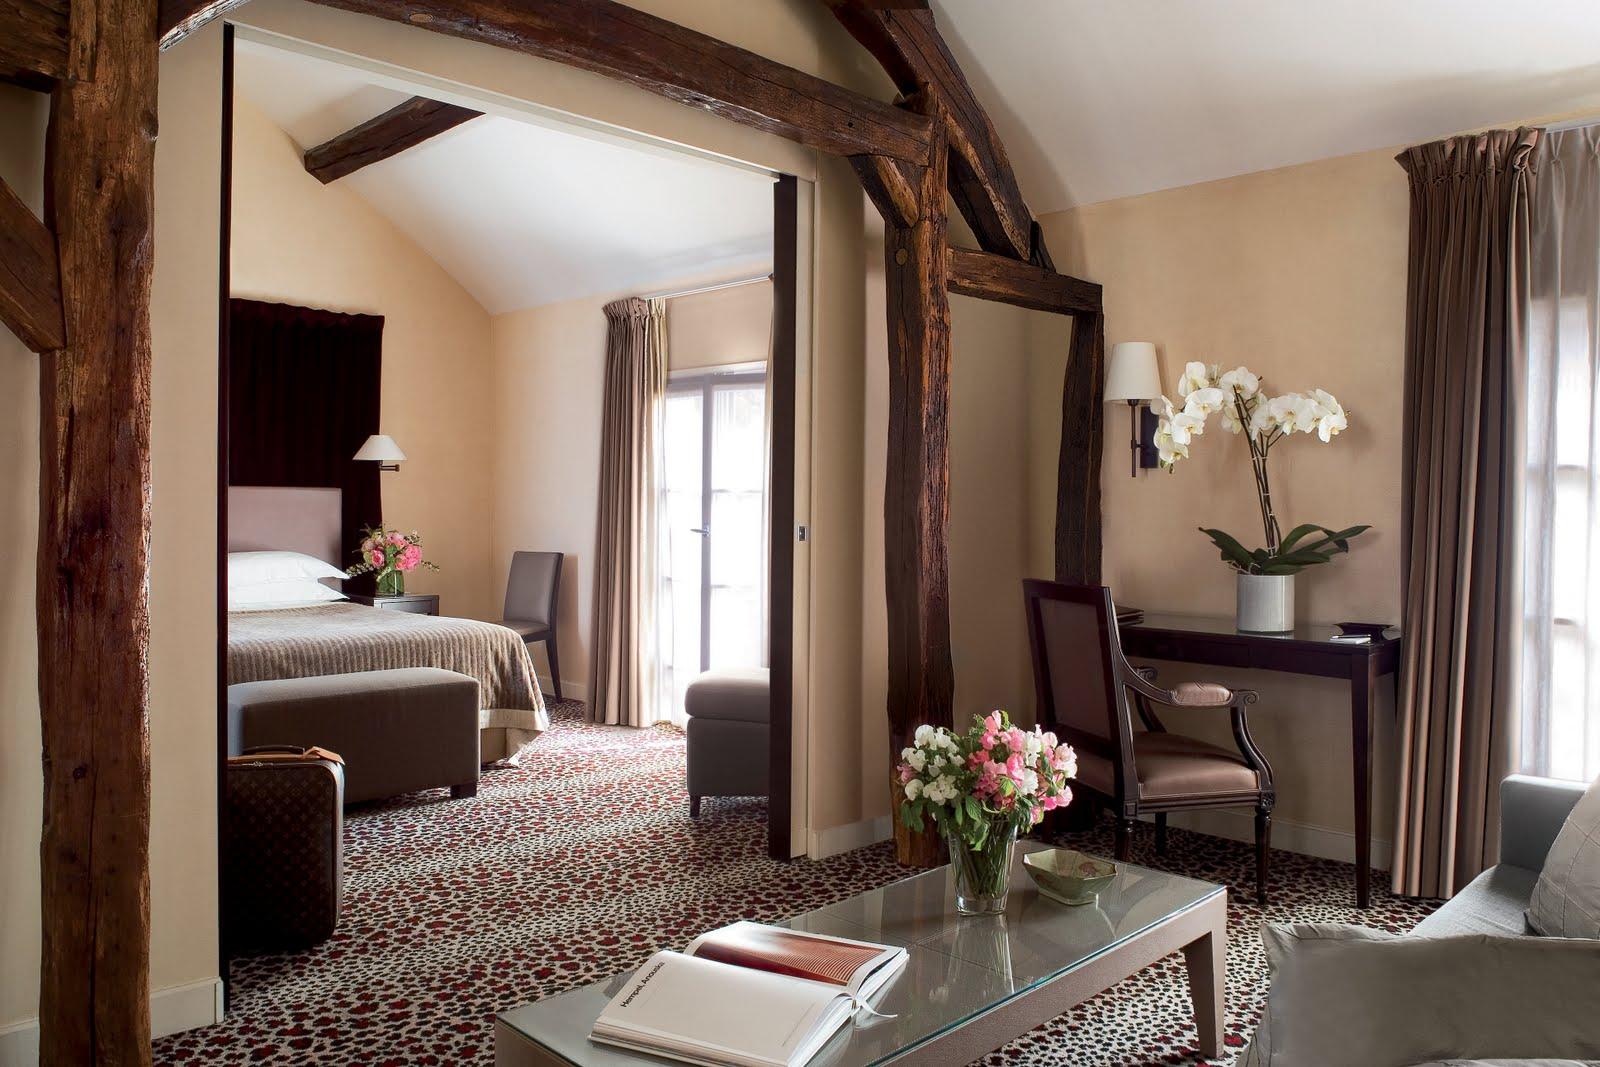 hotel esprit saint germain. Black Bedroom Furniture Sets. Home Design Ideas